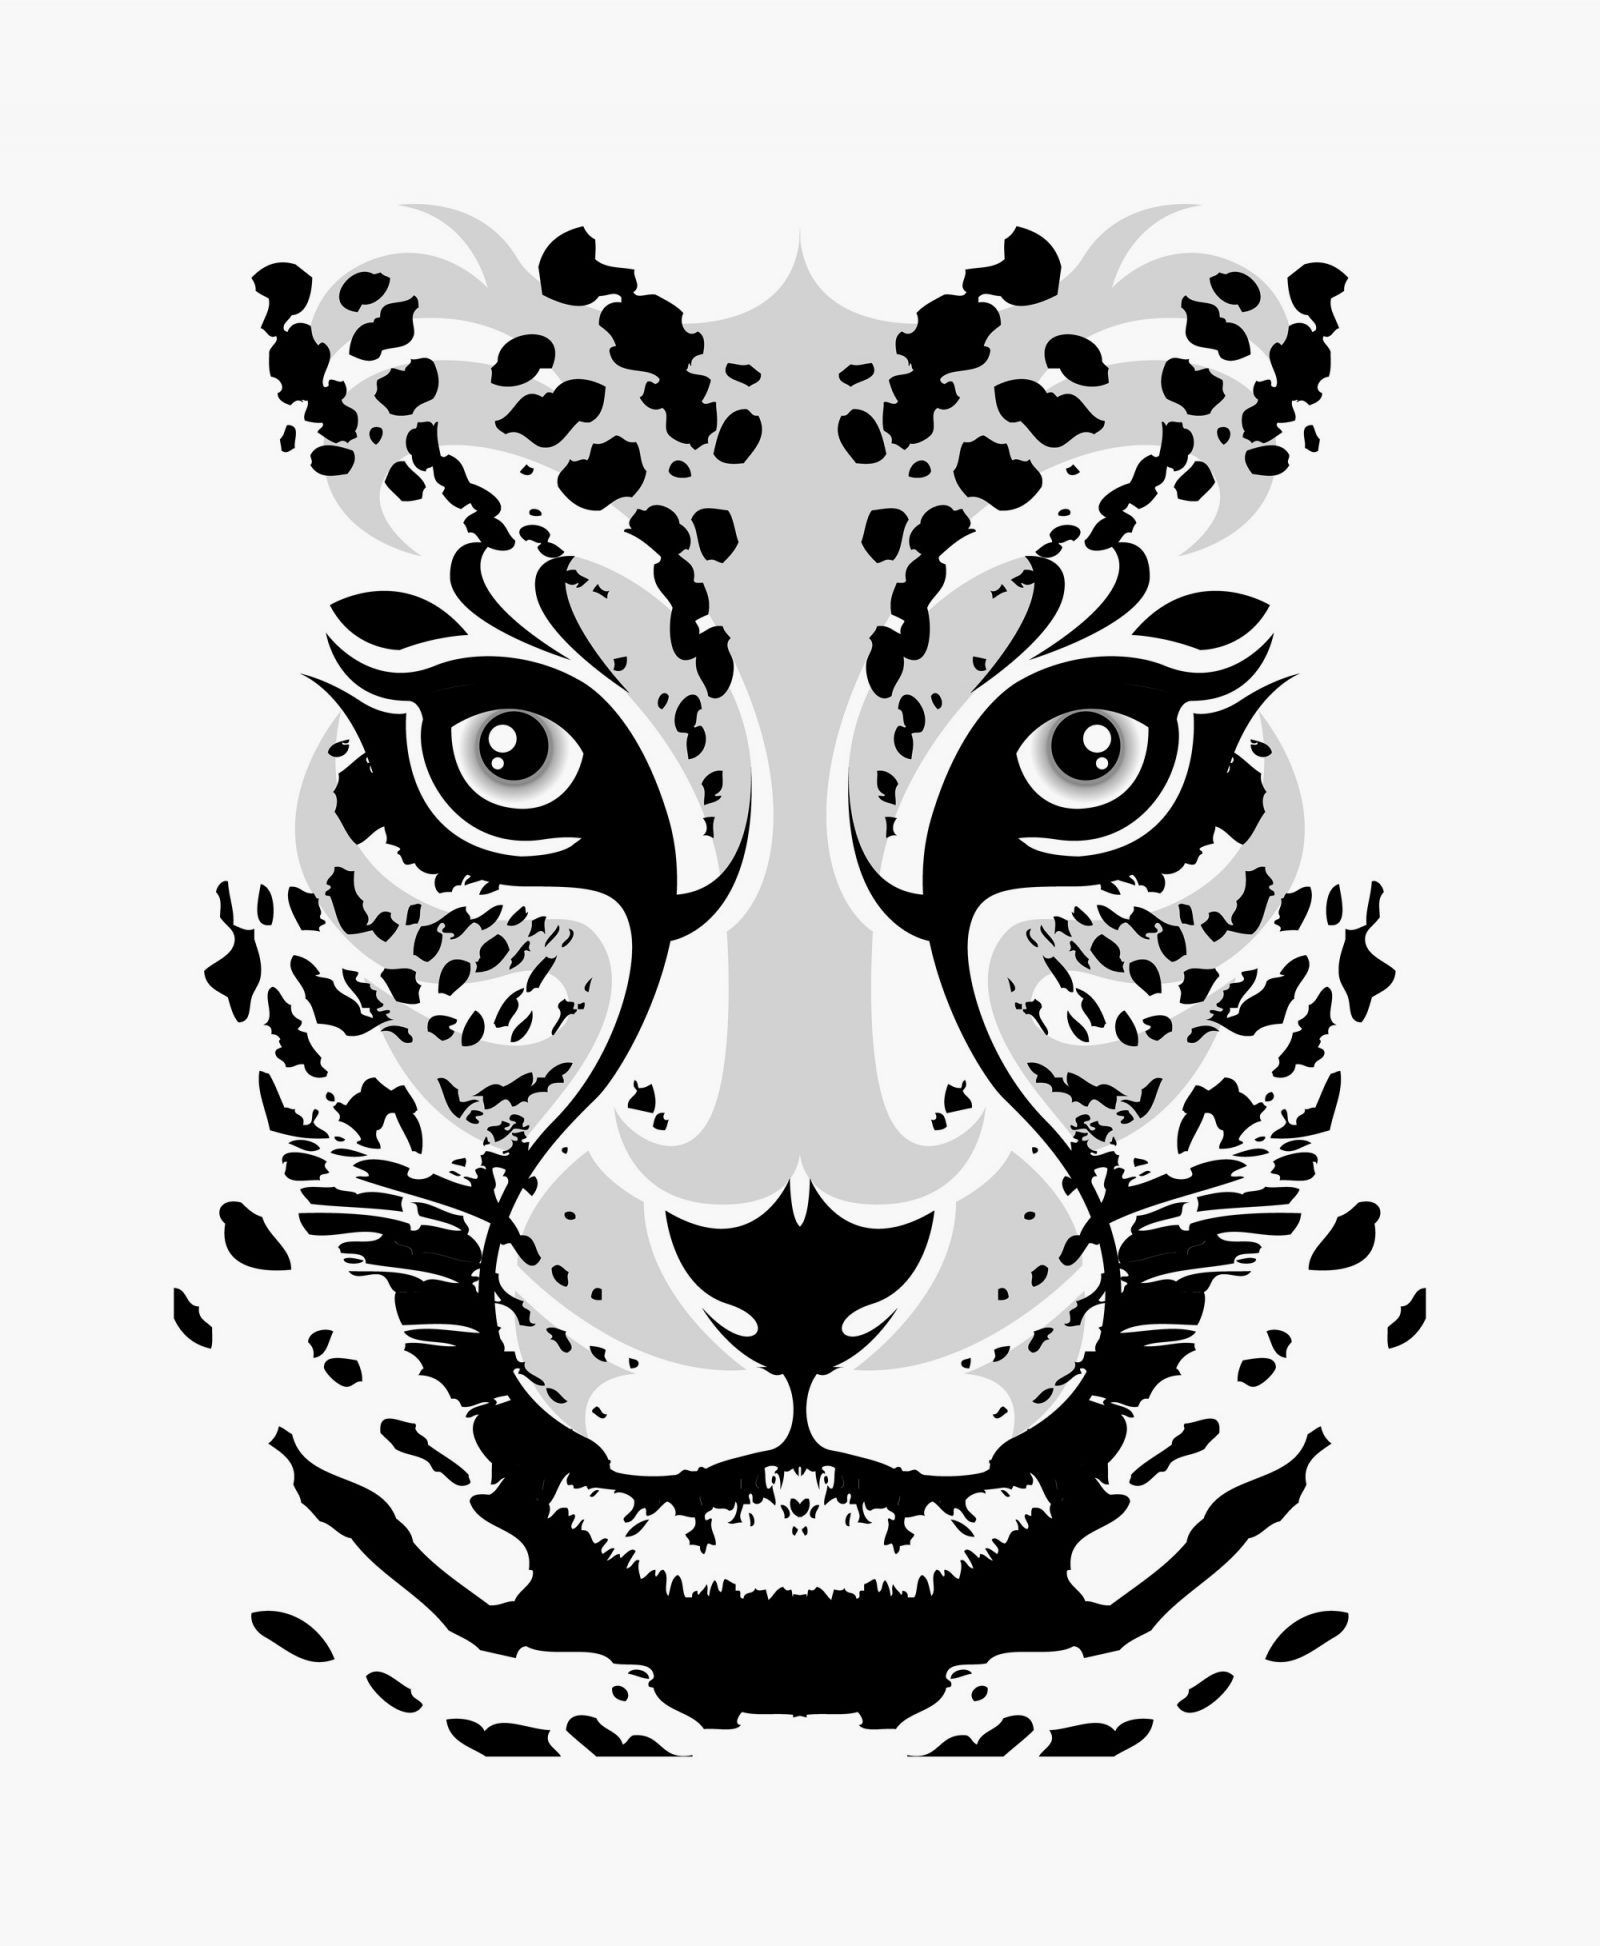 Jaguar artwork by Henry Egloff